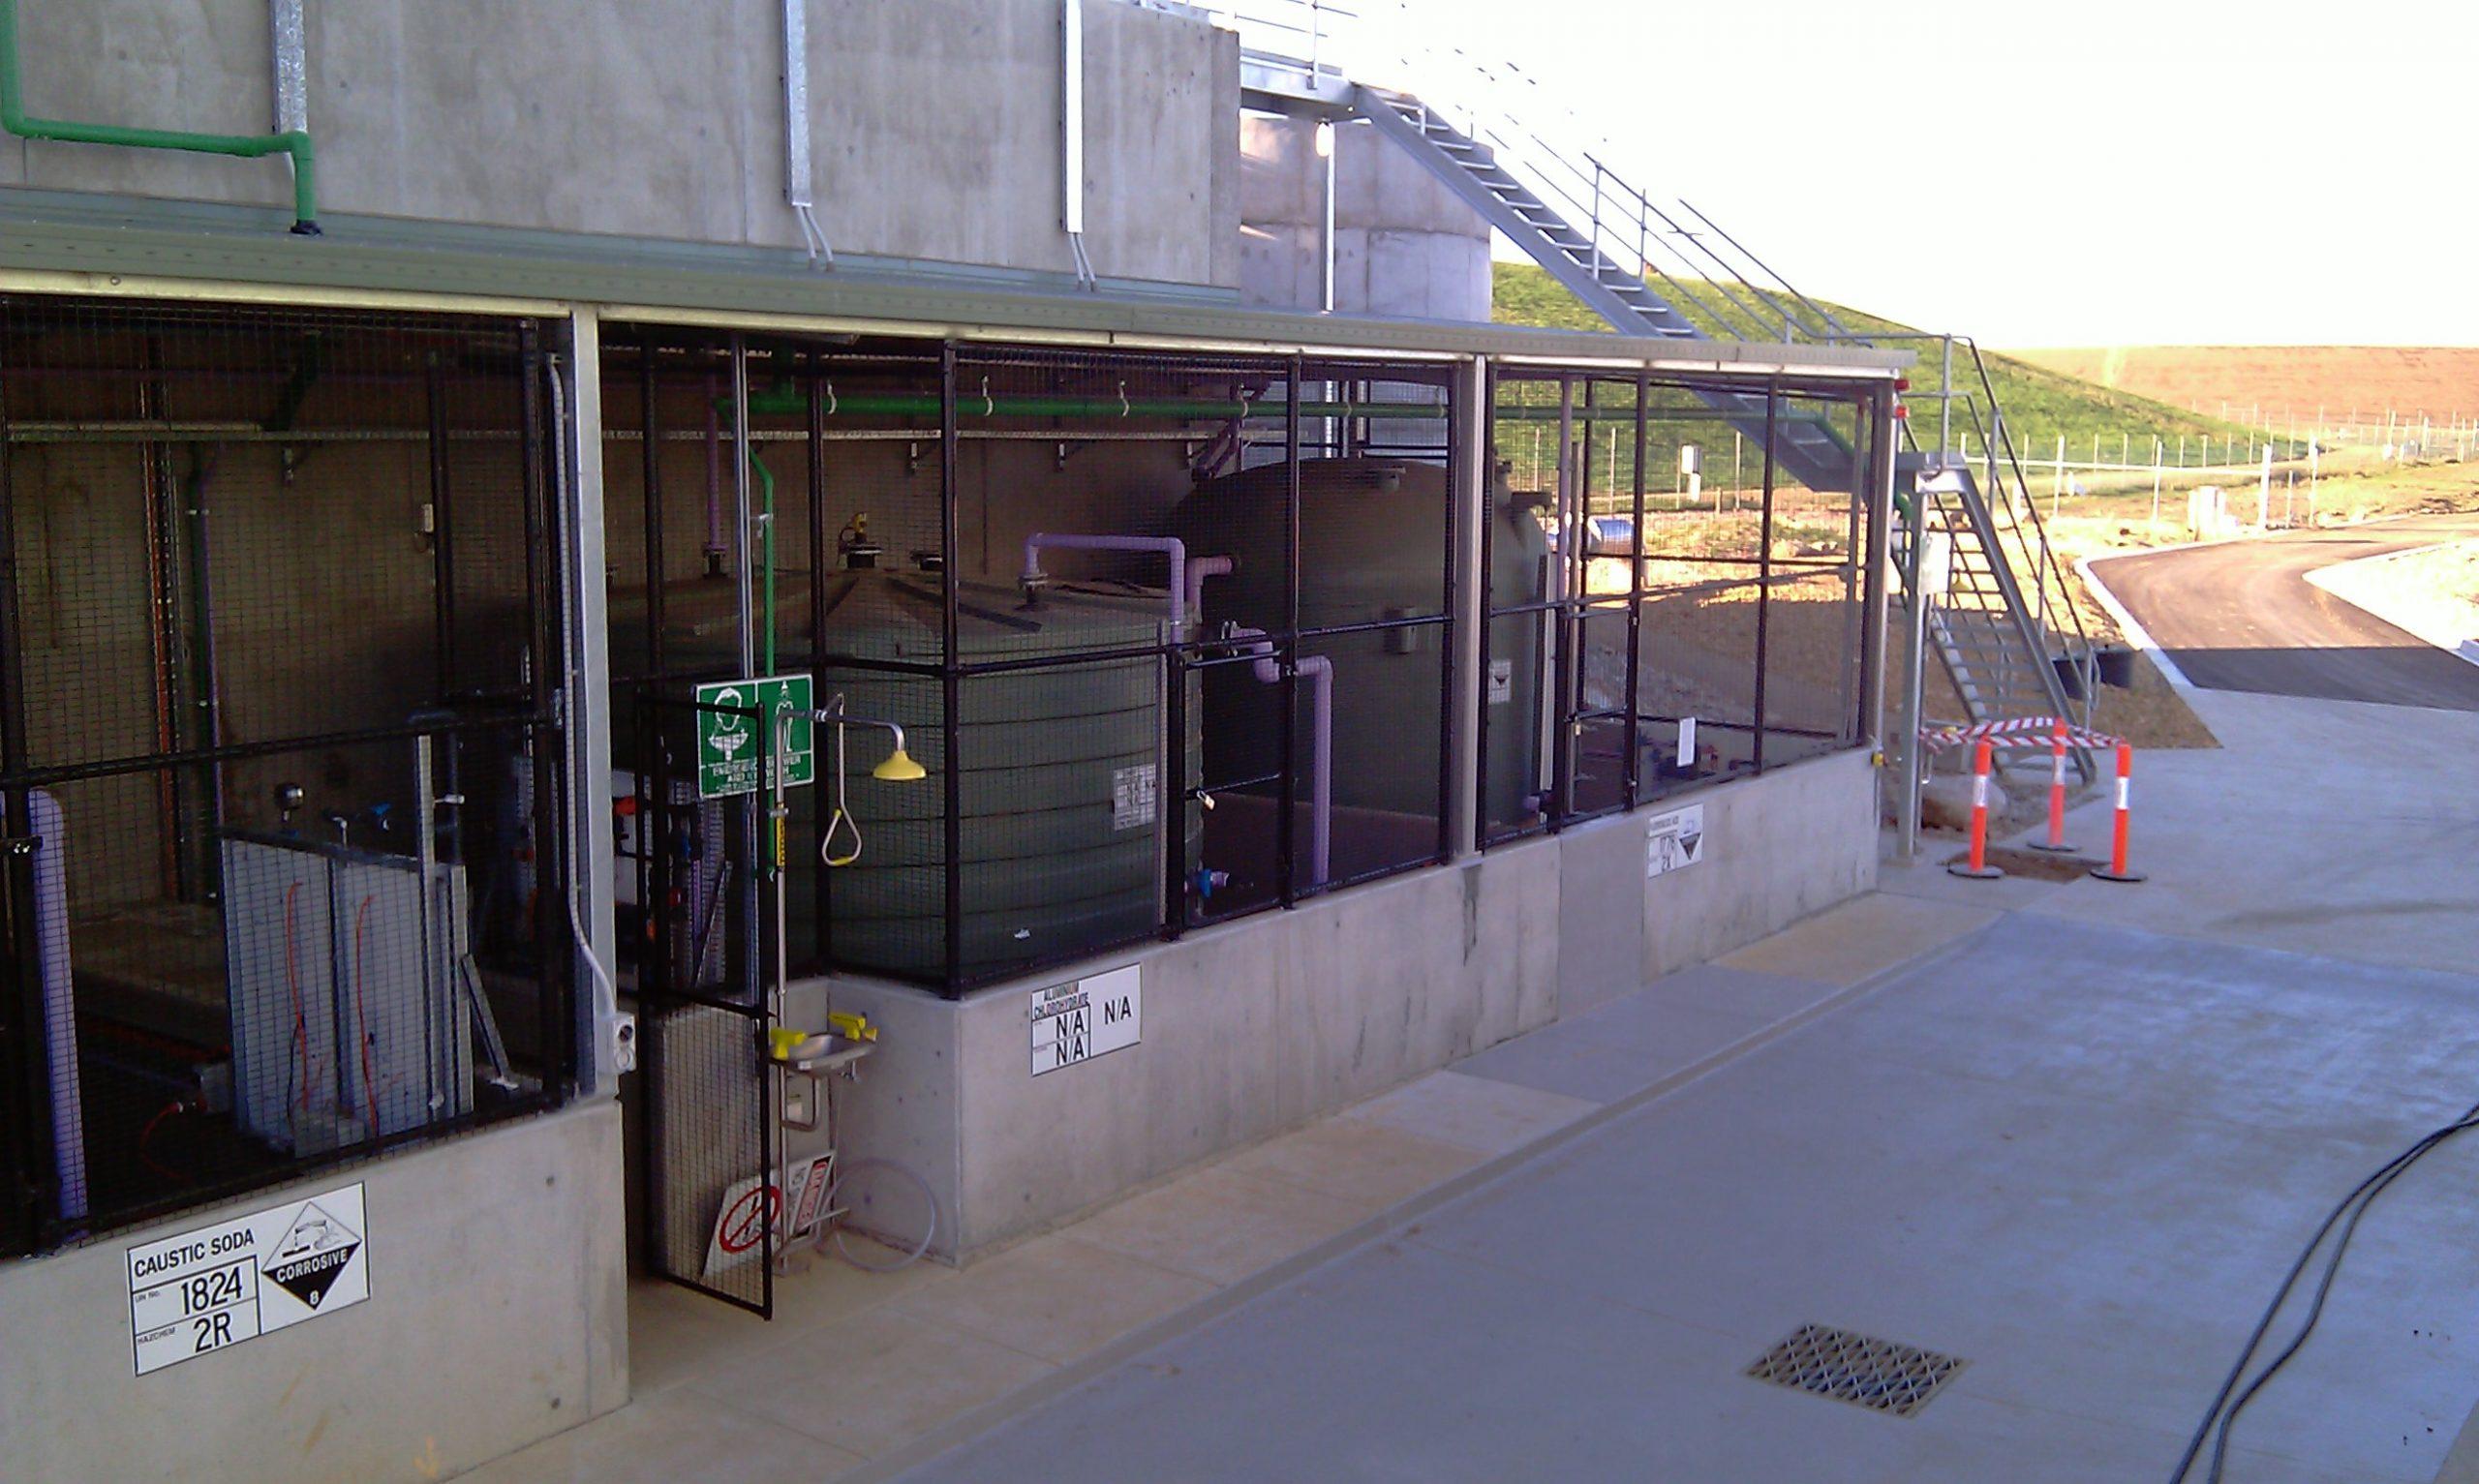 Woodglen WTP - Chemical Dosing Facilities